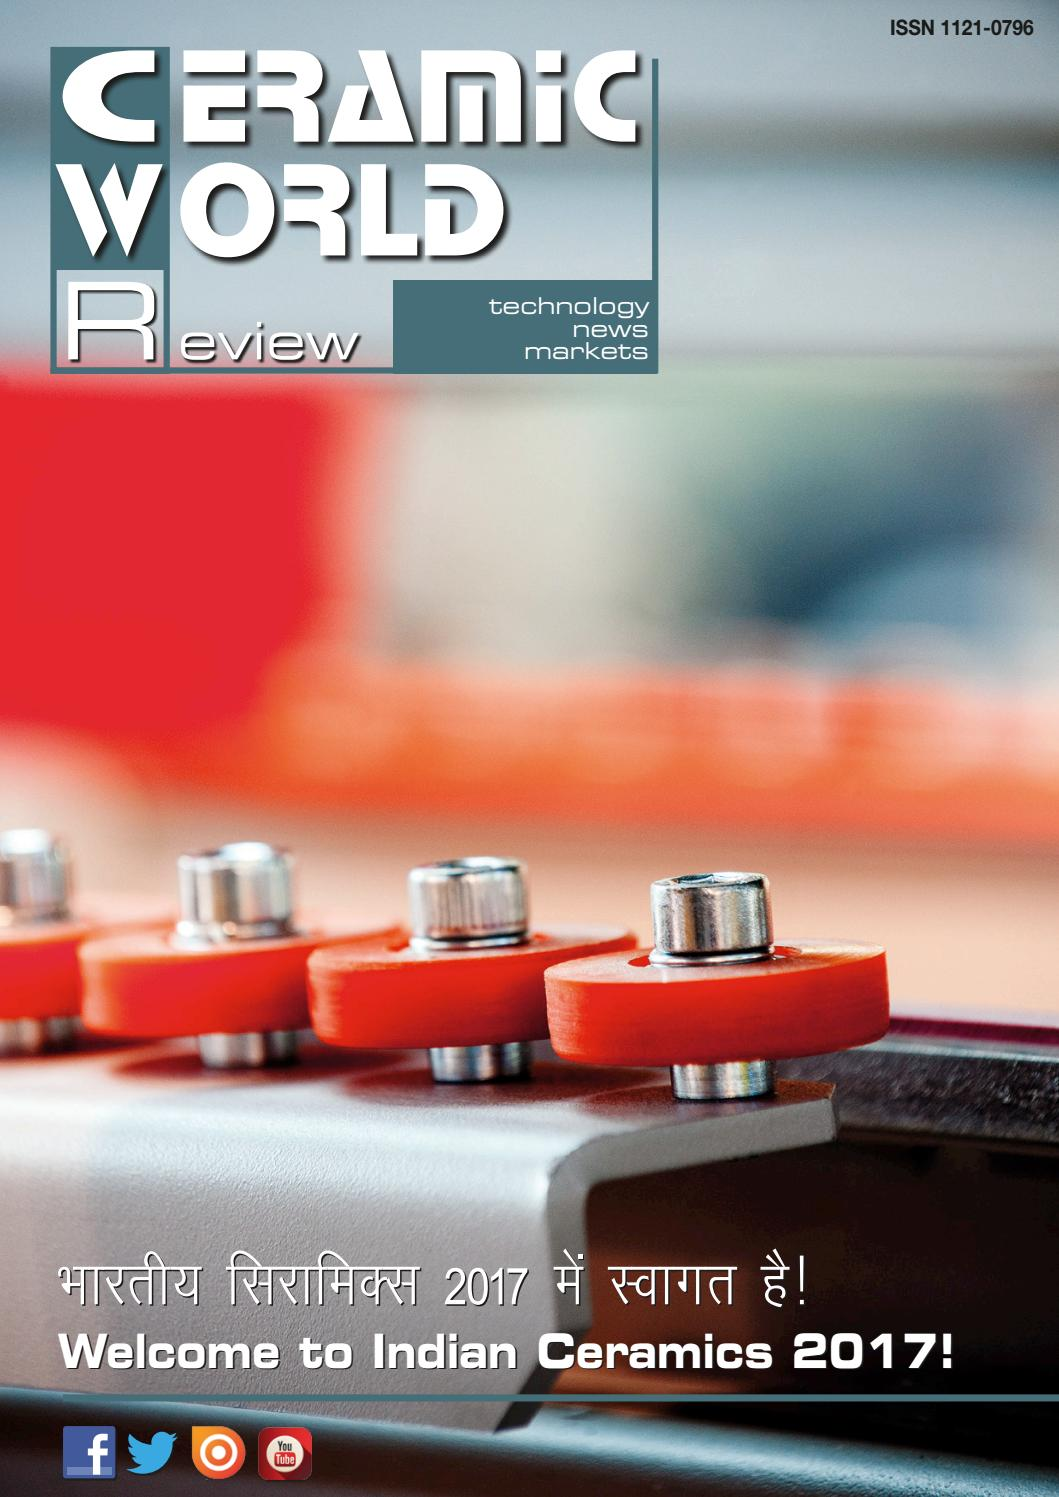 Ceramic world review india 2017 by tile edizioni issuu dailygadgetfo Choice Image